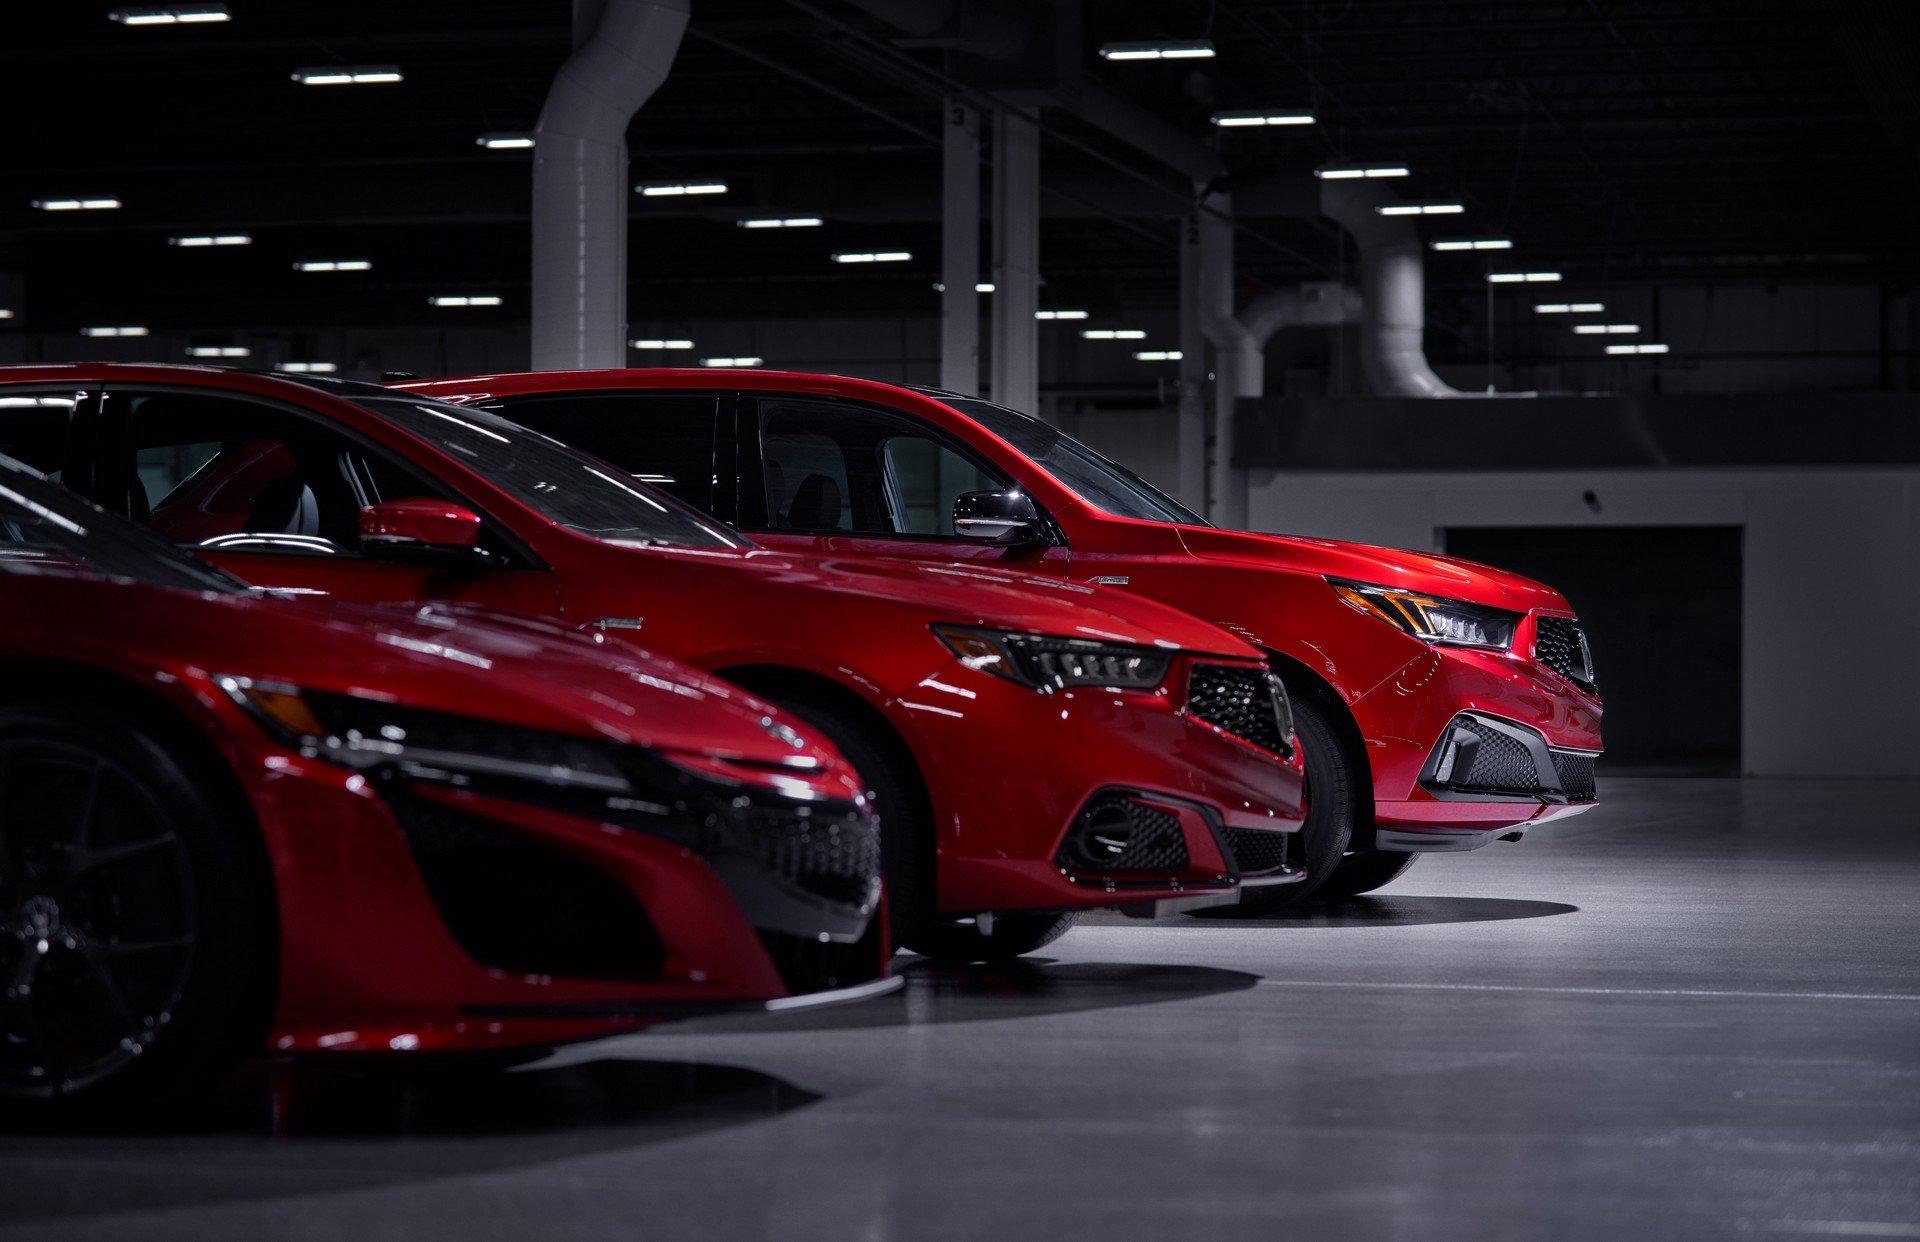 Acura-MDX-PMC-Edition-8